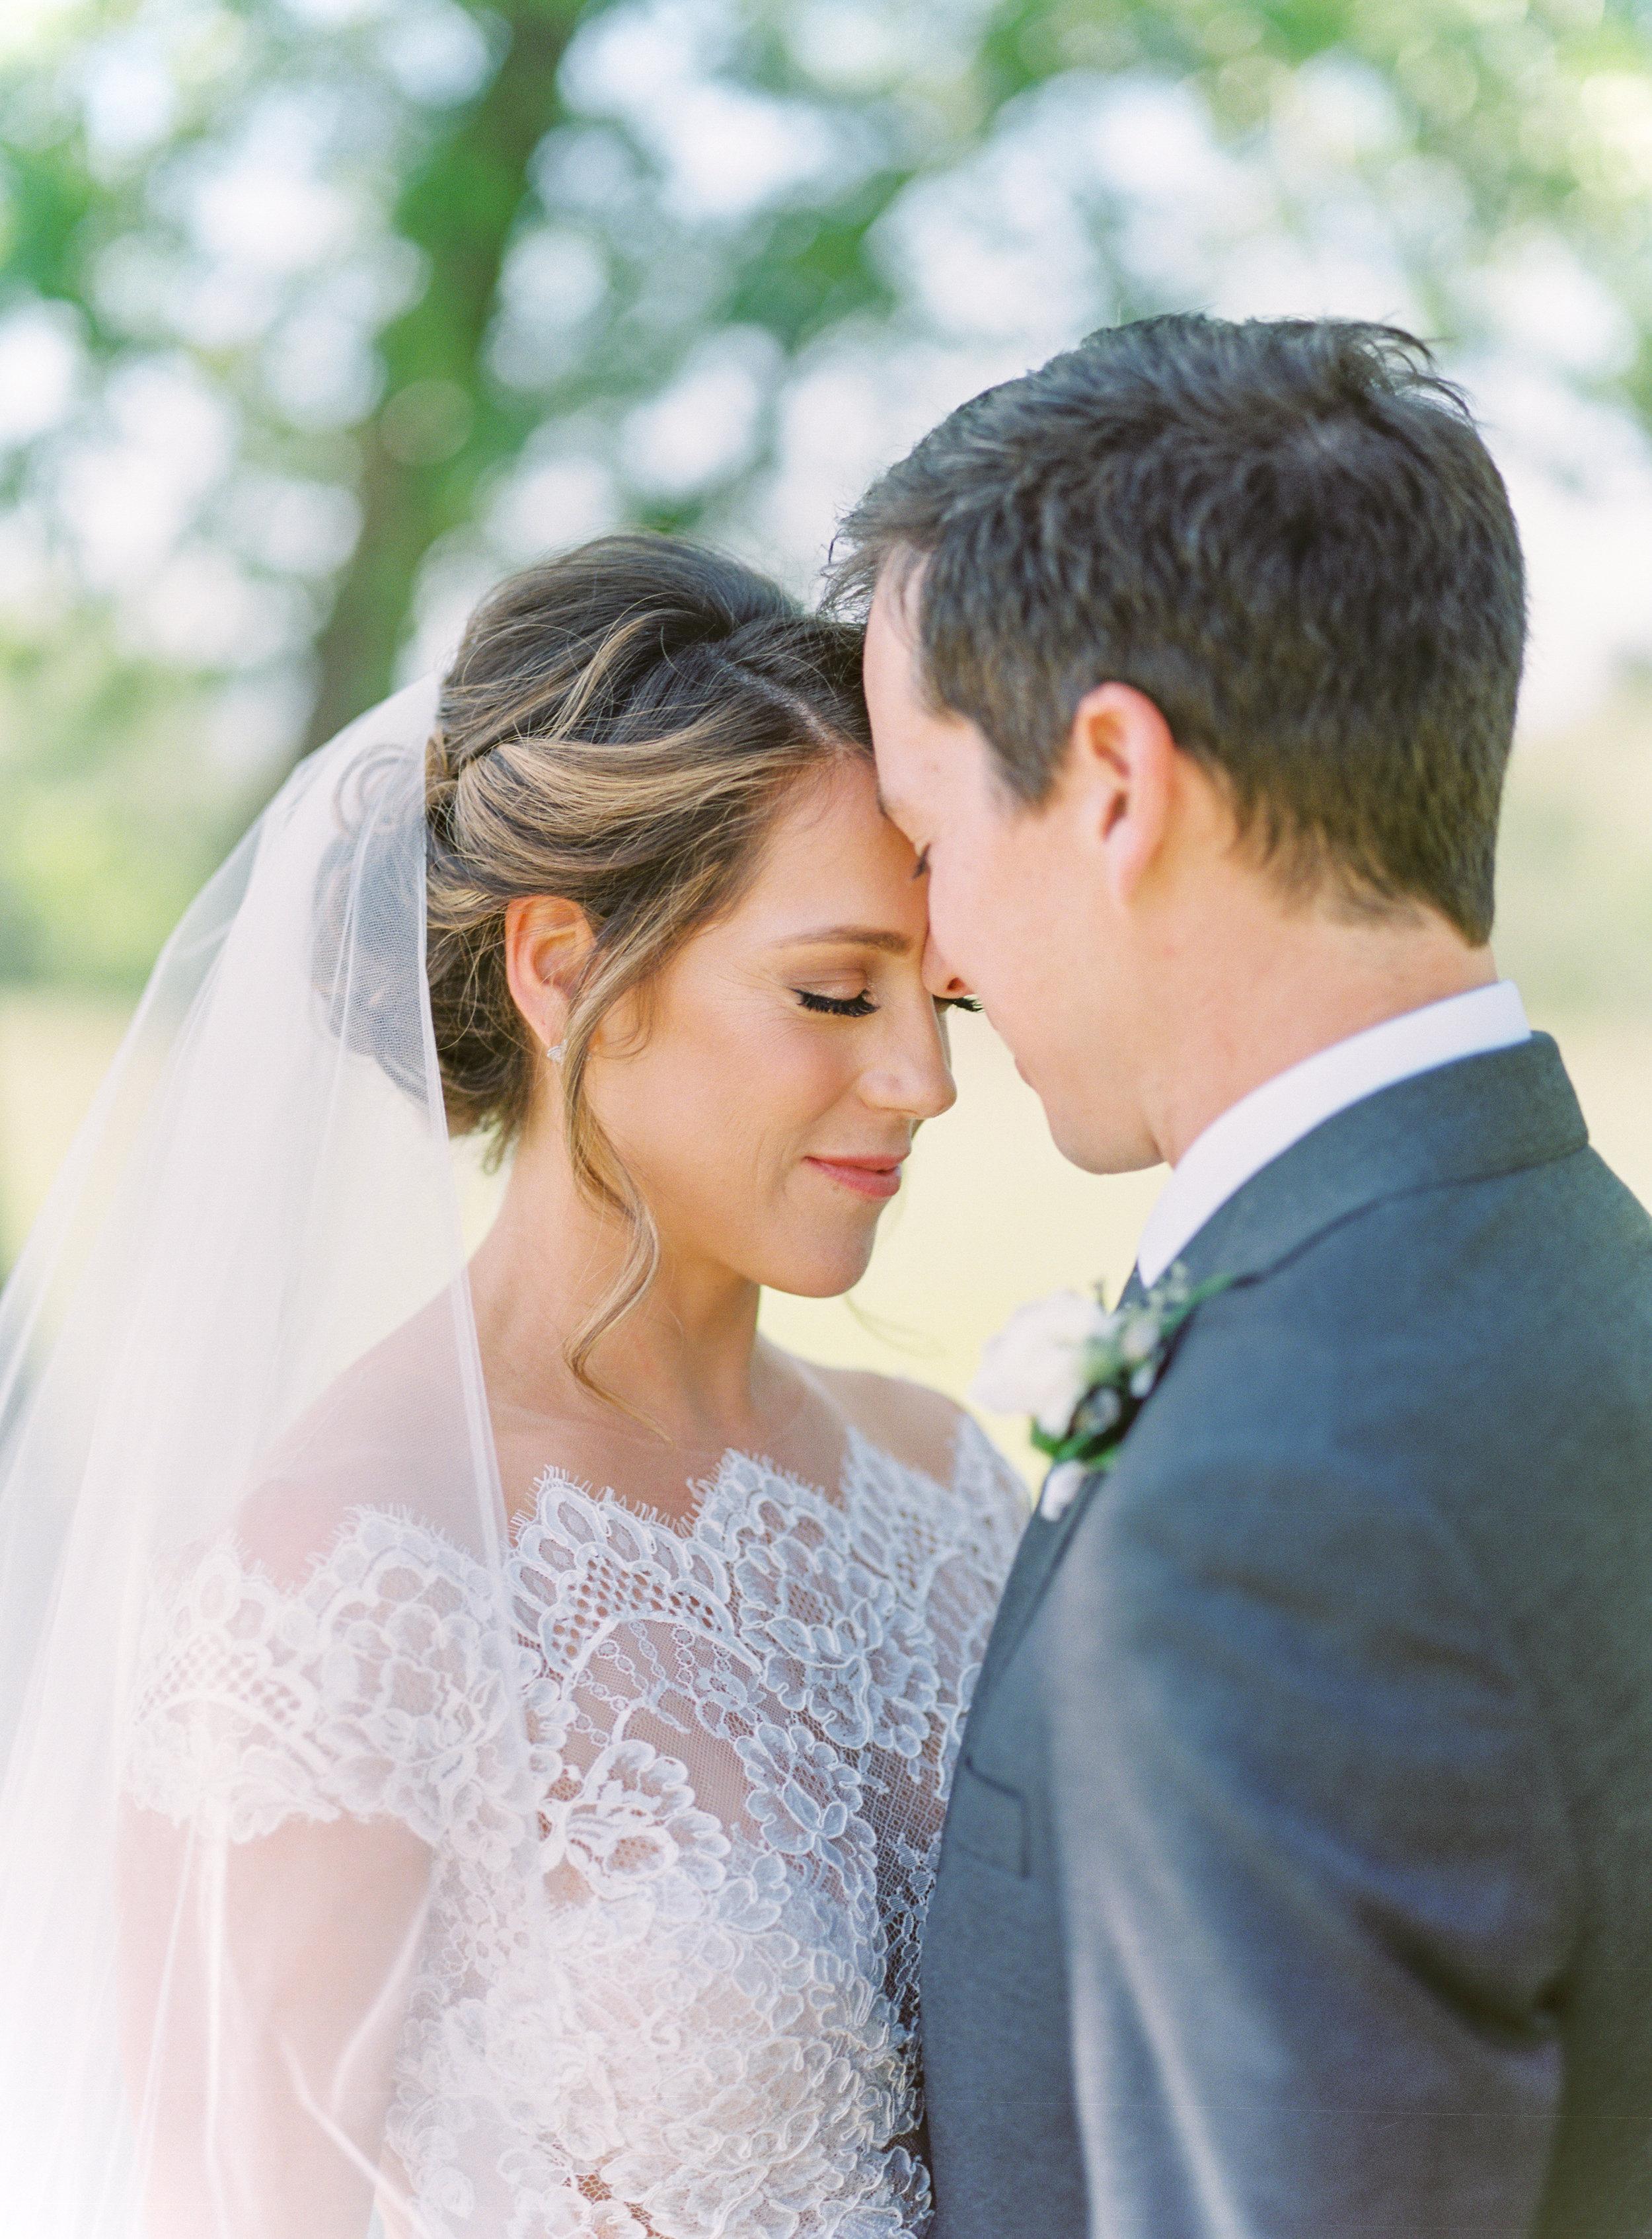 Kathryn-Allen-Boulder-wedding-2018-by-Lisa-ODwyer-110.jpg